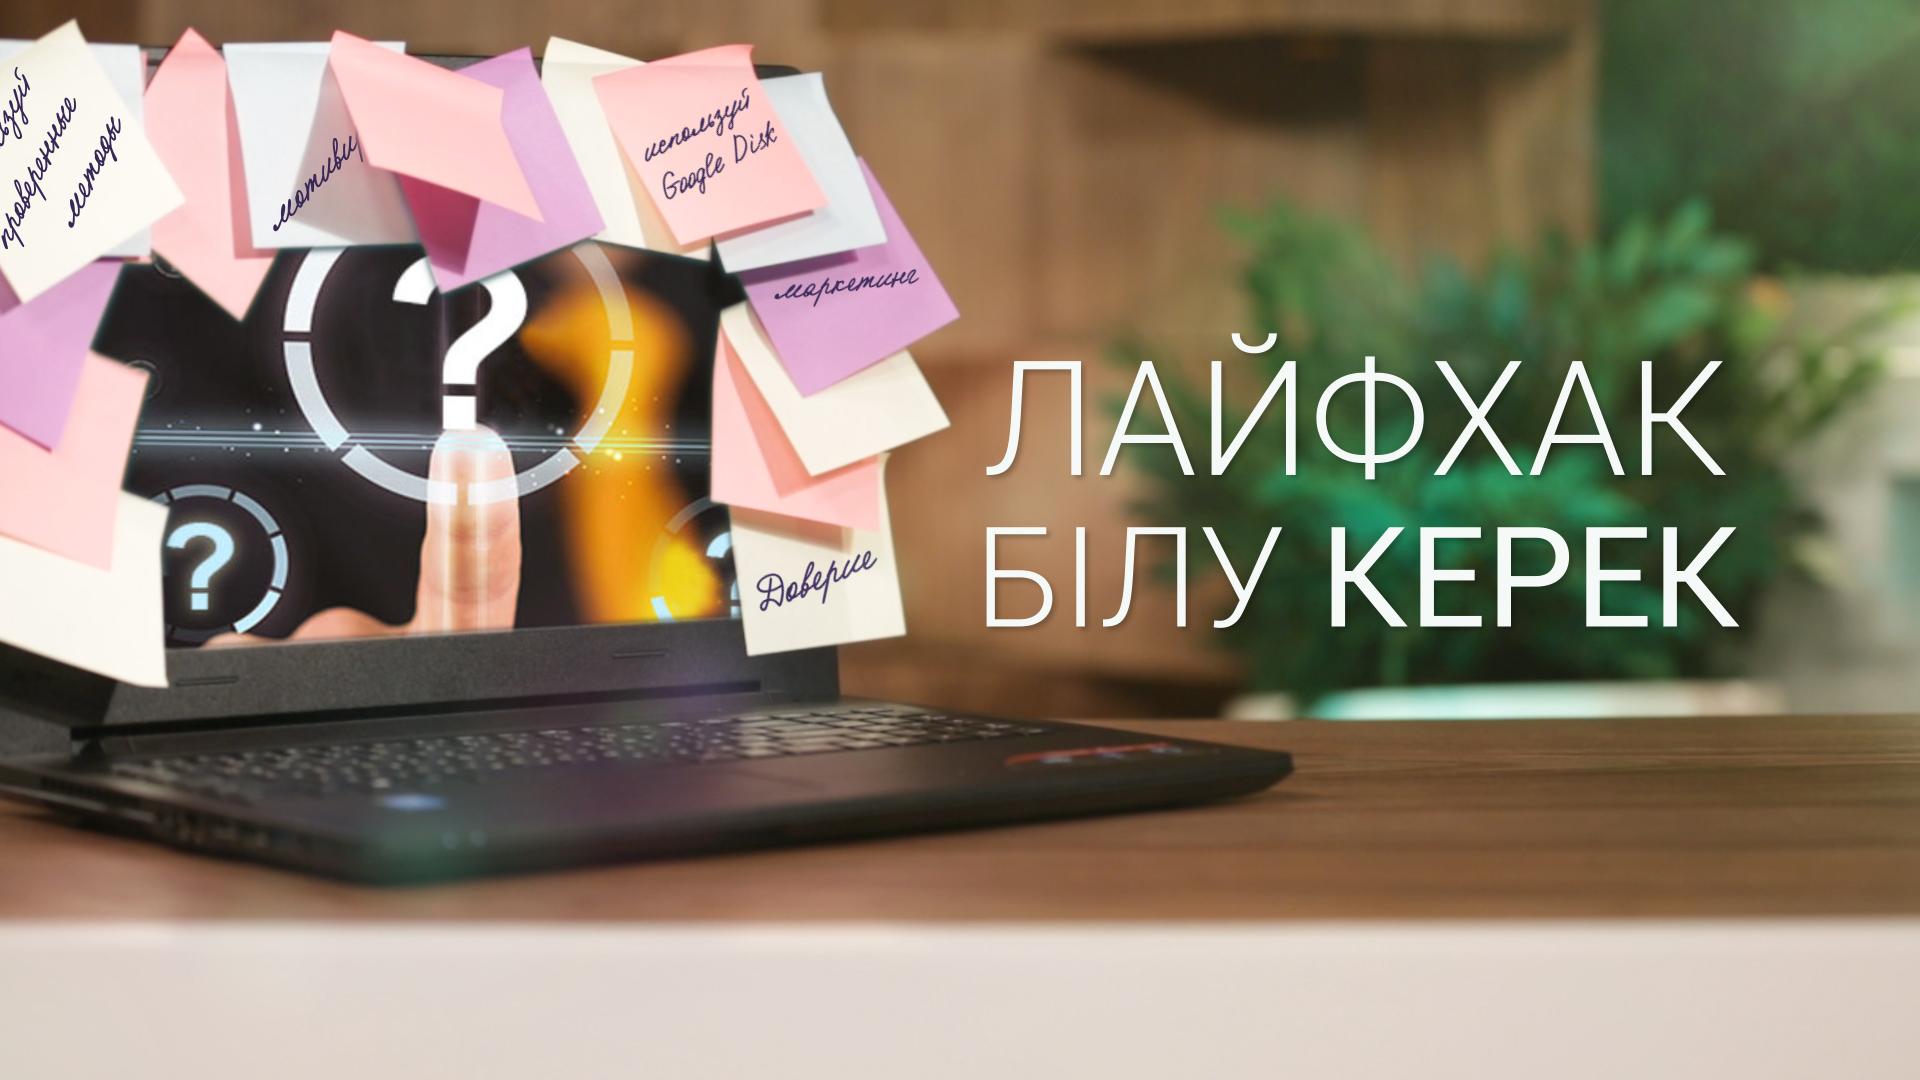 https://inbusiness.kz/images/programbig/1/images/80fdh0BR.jpg